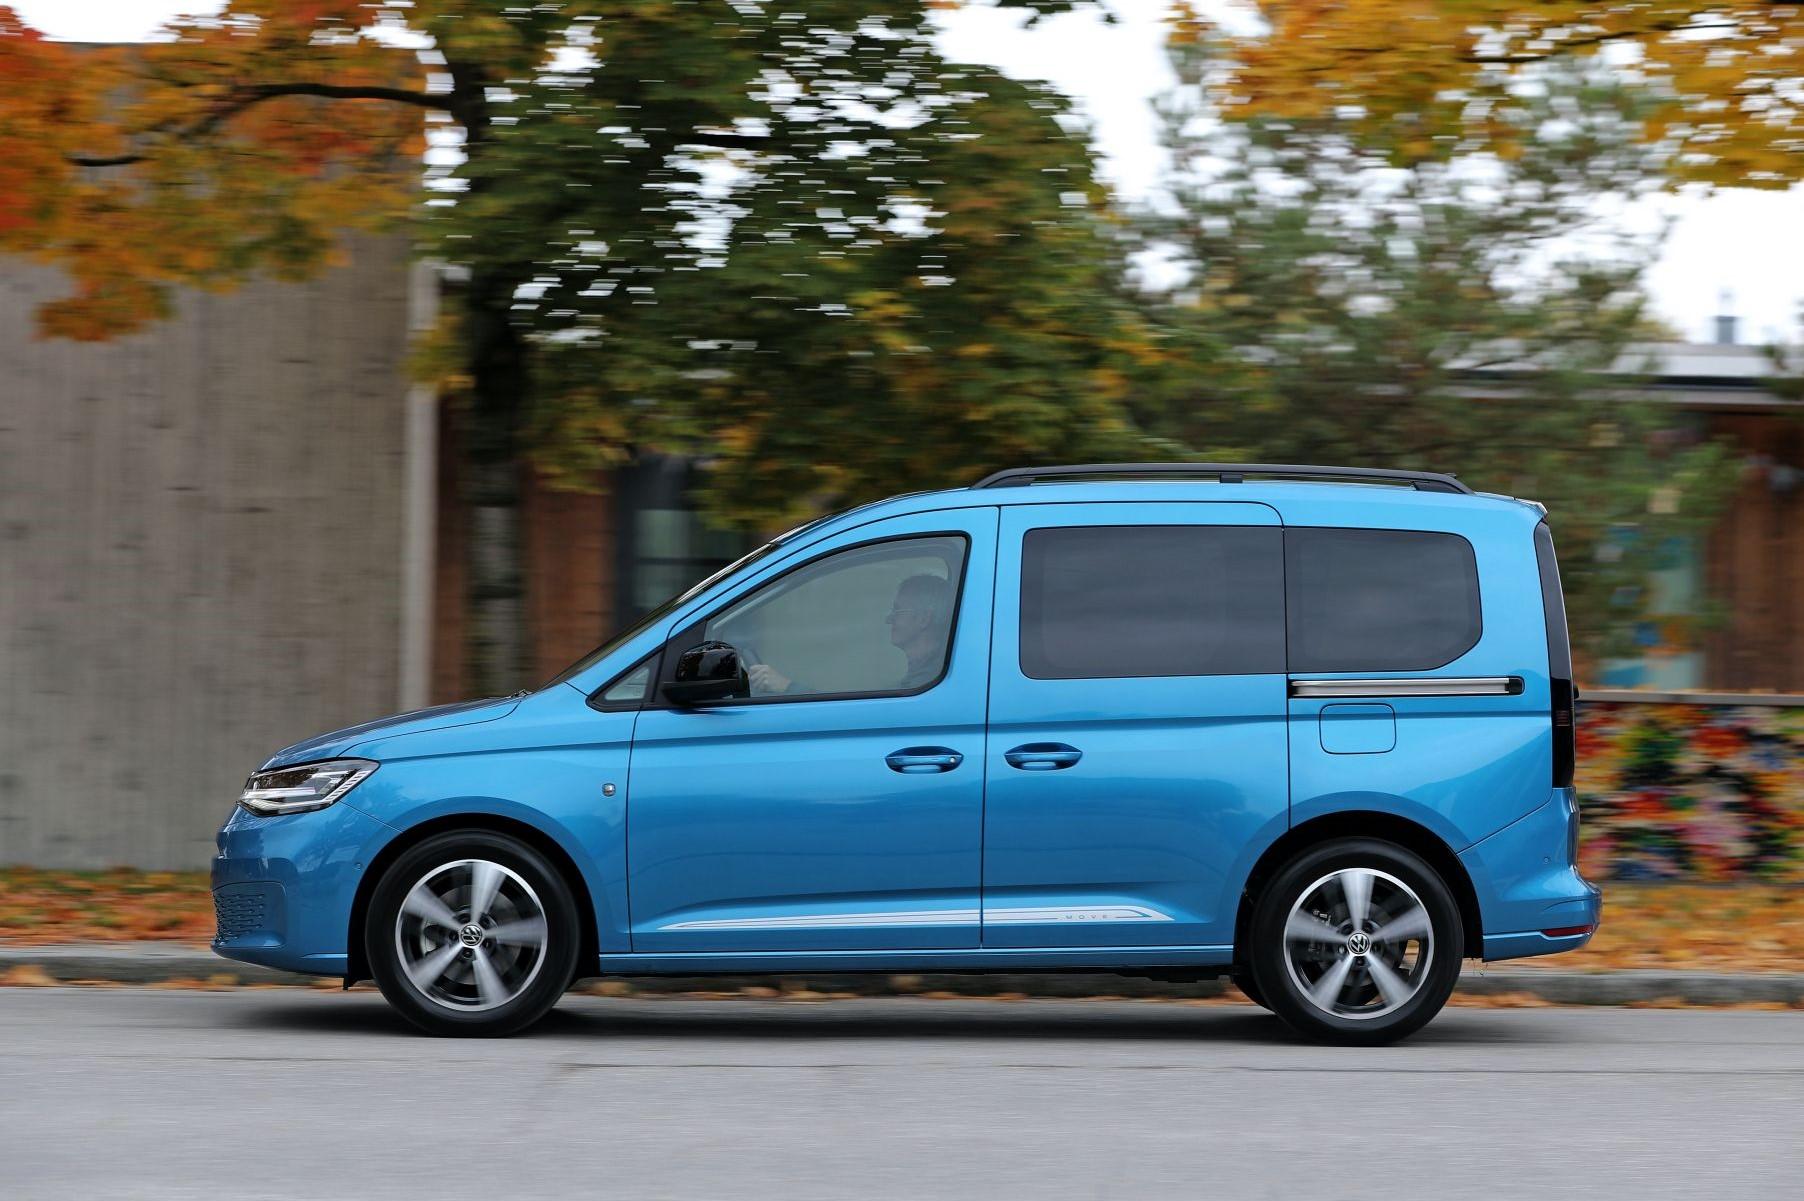 2021 Volkswagen Caddy 2.0 TDI (122 Beygir) Life ...